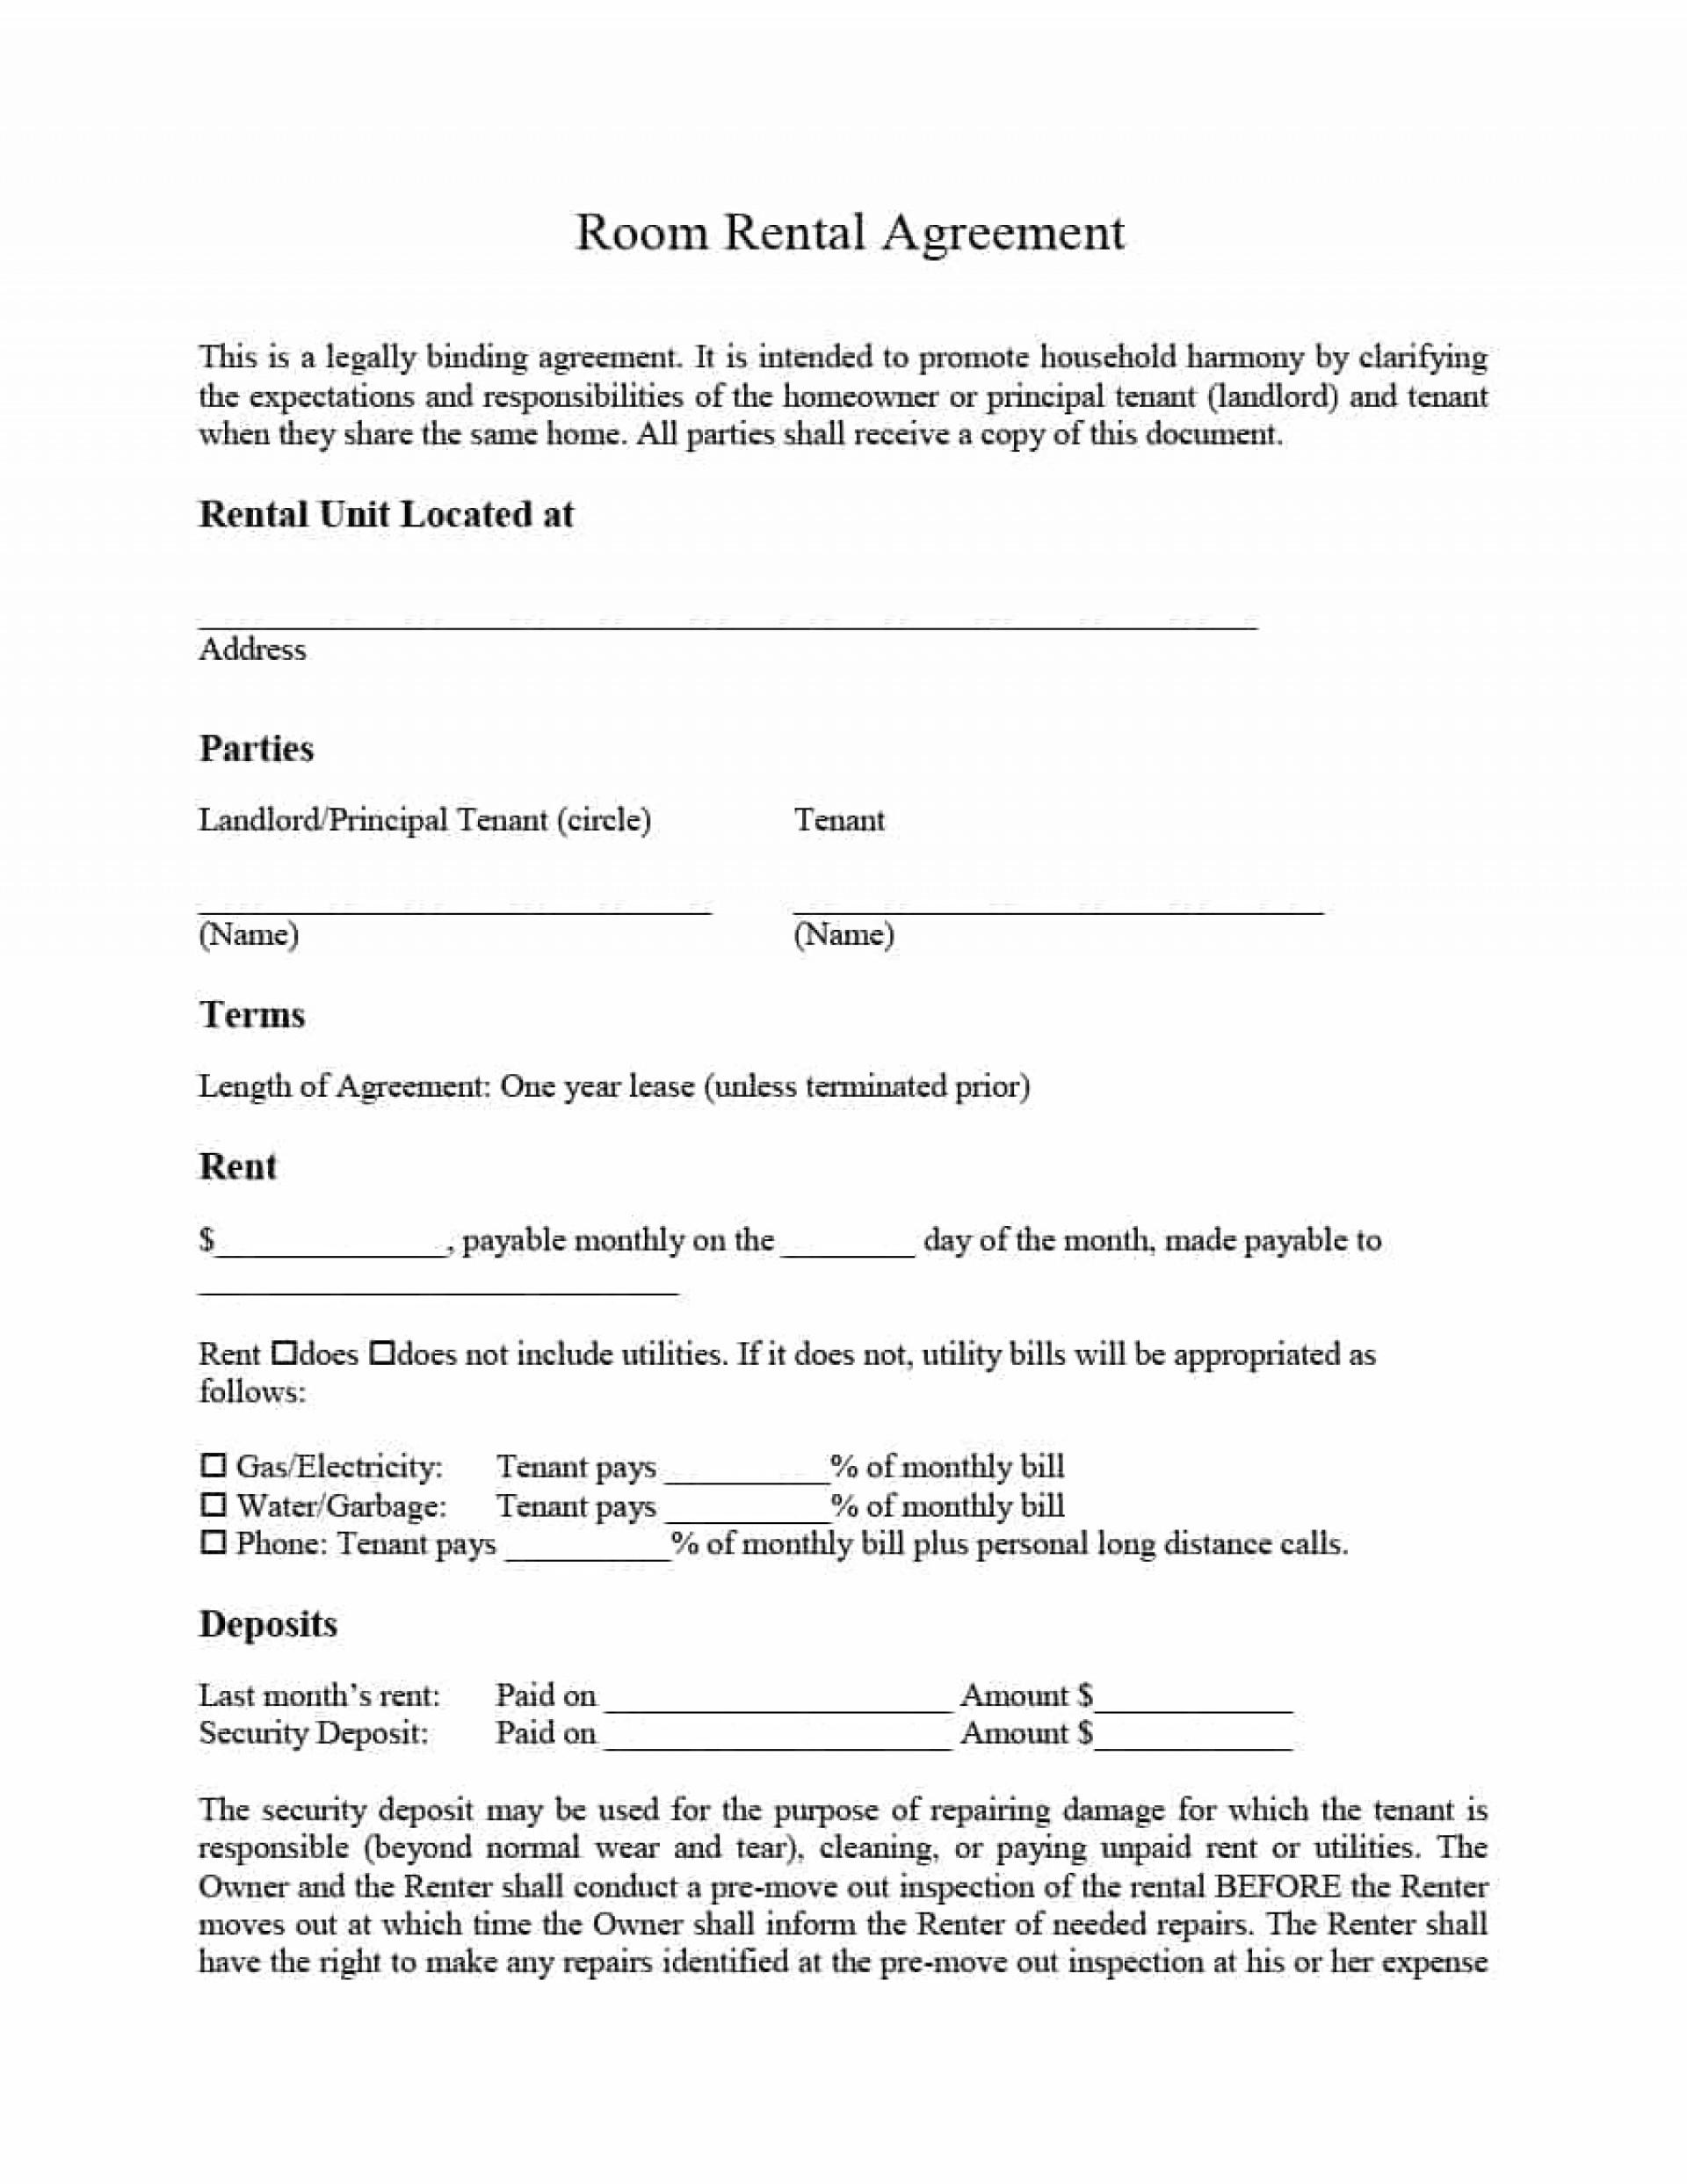 Room Rental Agreement Template Idea  Word Doc Malaysia Singapore Pdf1920